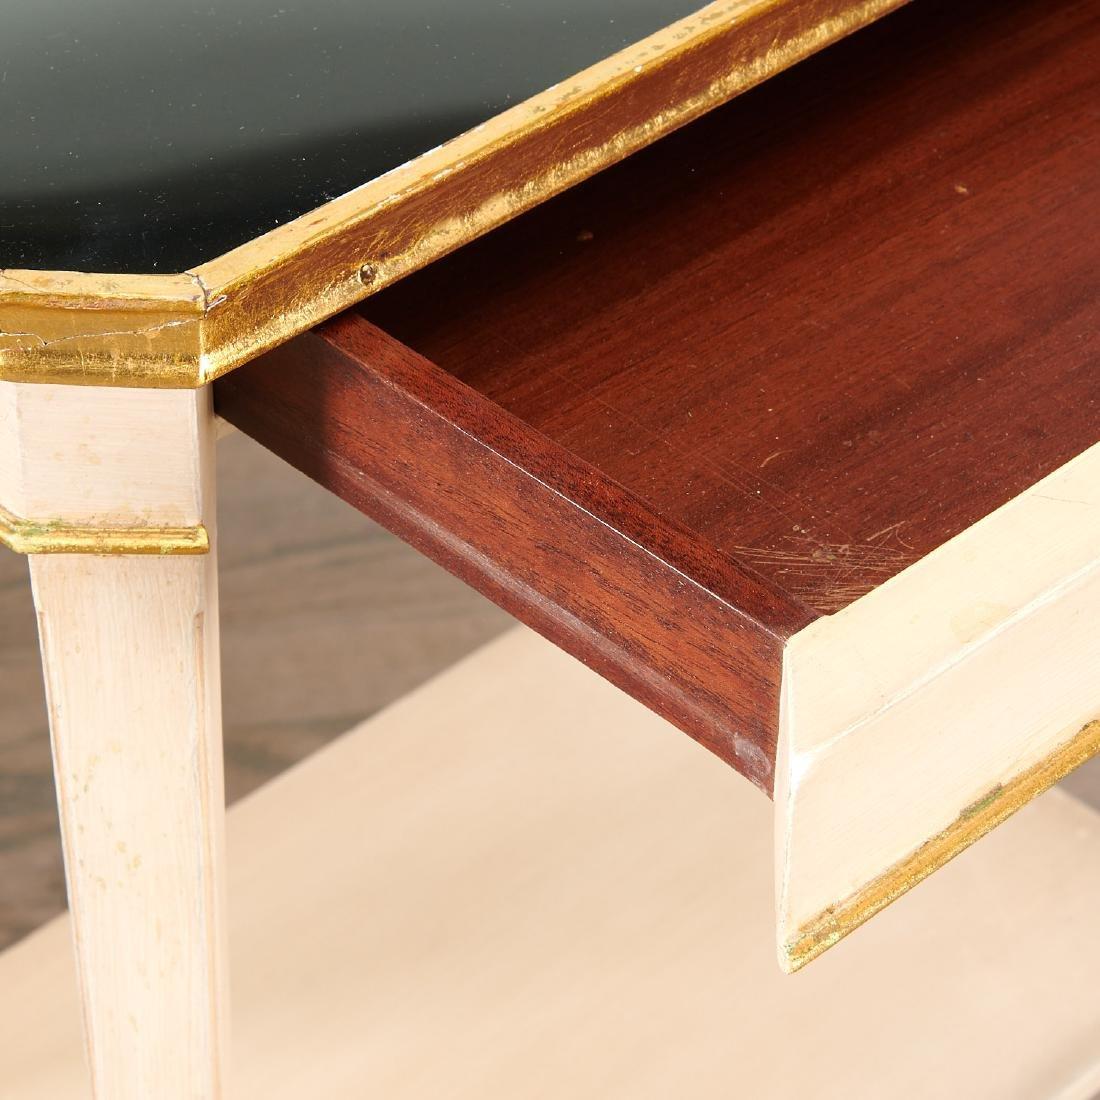 Fine Maison Jansen tiered side tables - 6